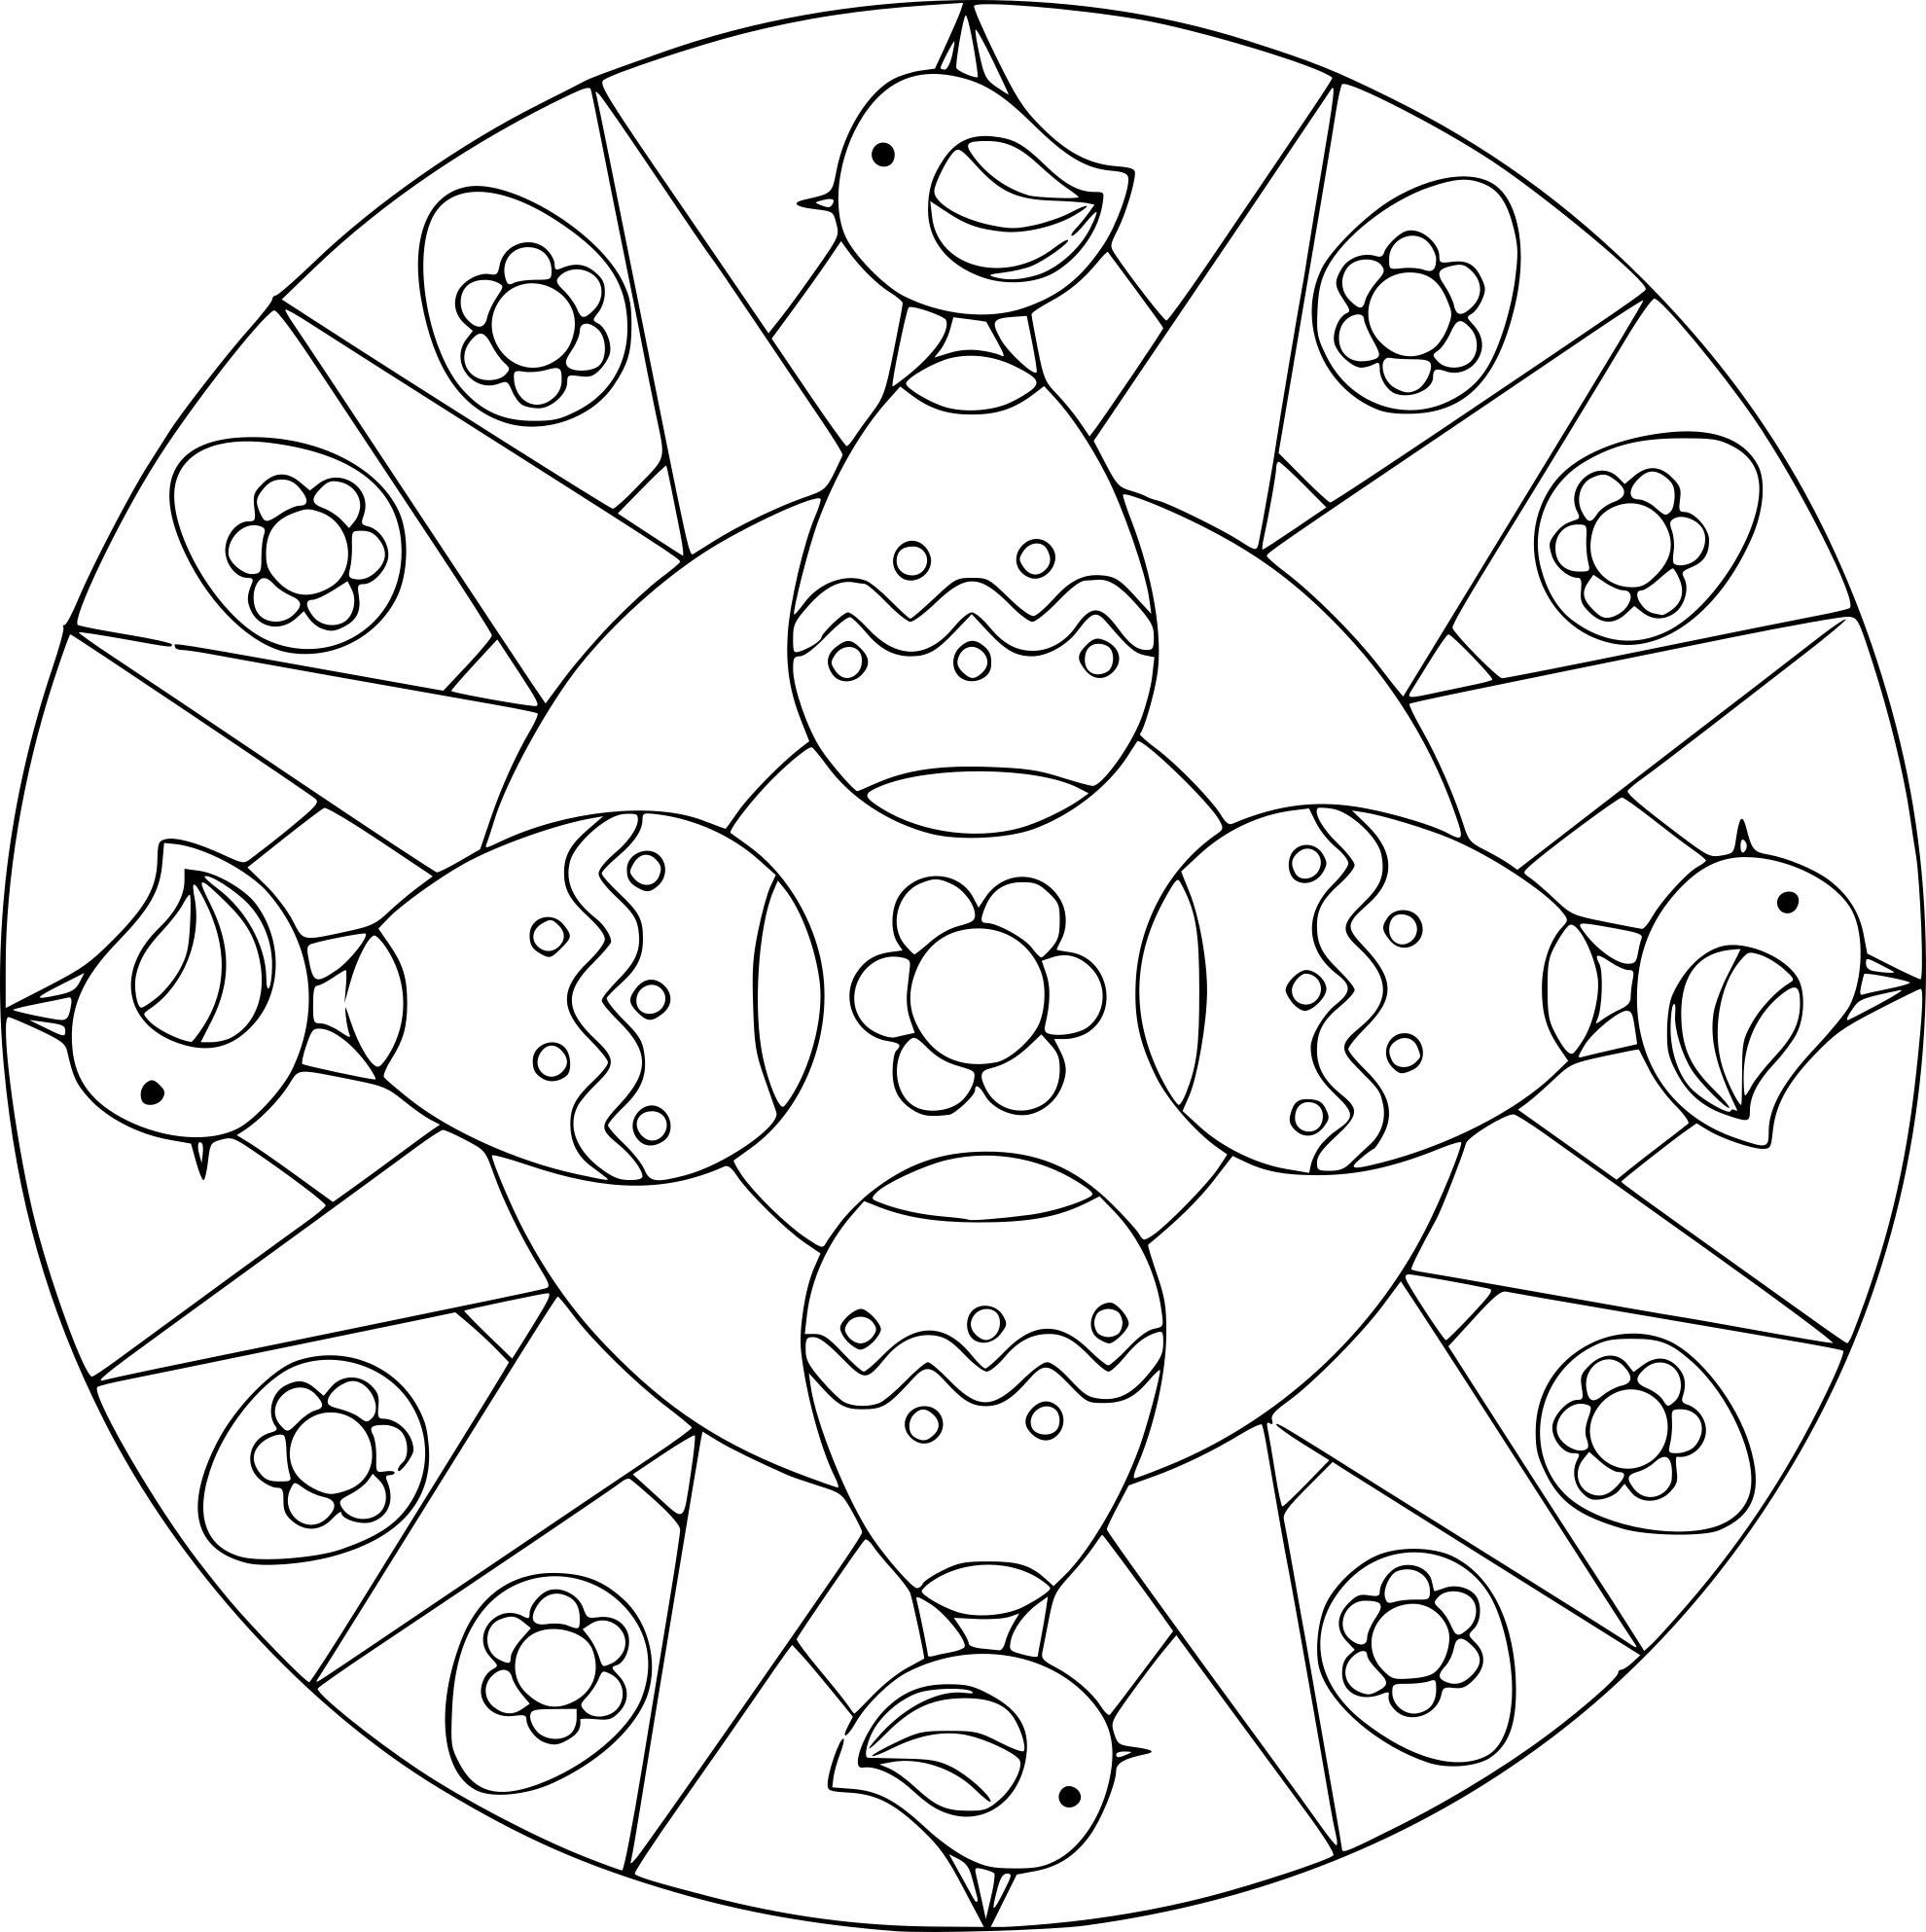 Coloriage Mandala Oeuf De Paques.Haut Coloriage Oeuf De Paques Mandala Coloriage A Imprimer